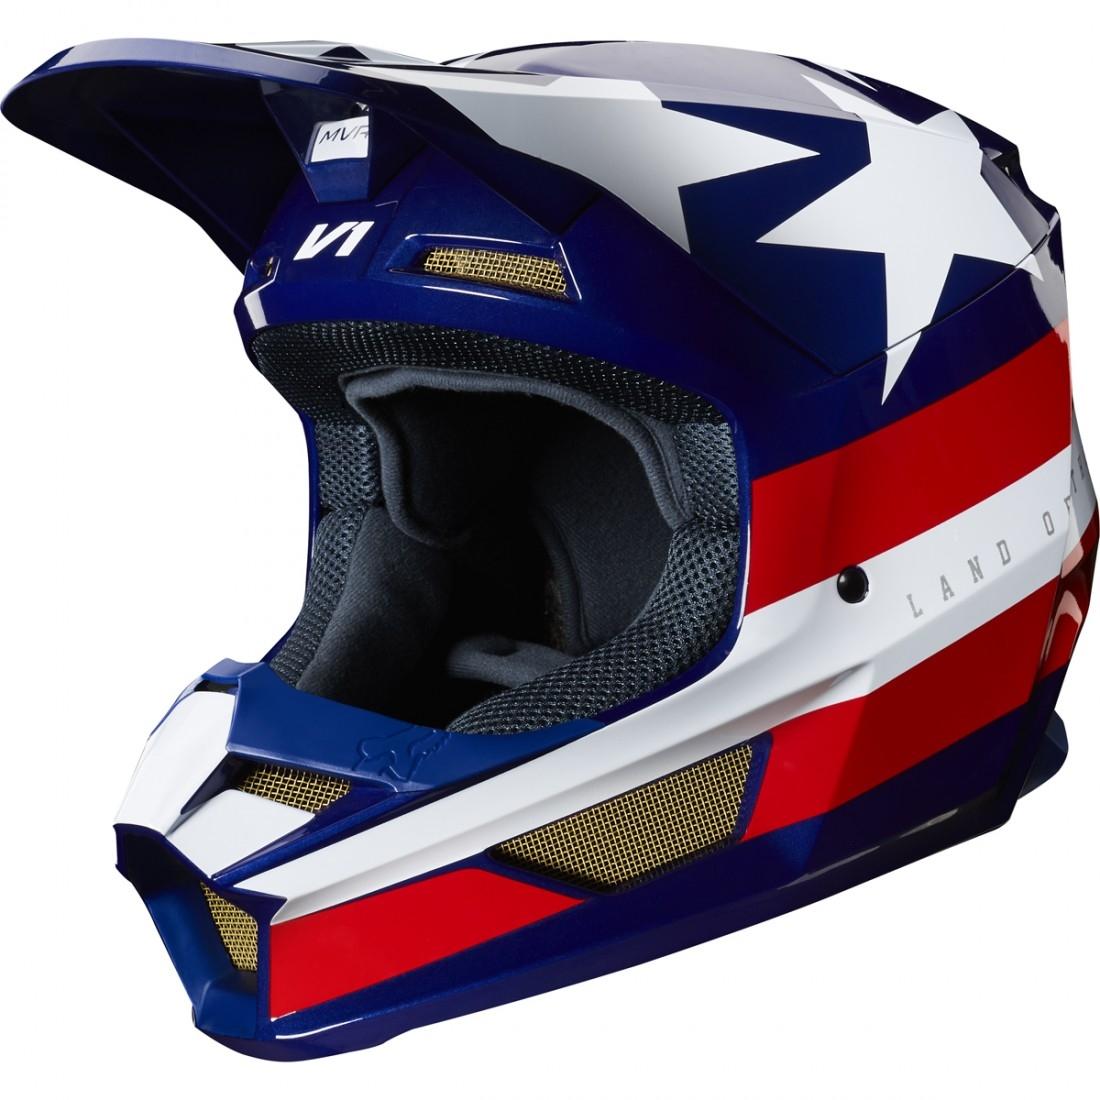 5b637c34 FOX V1 2019 Regl SE MXON White / Red / Blue Helmet · Motocard